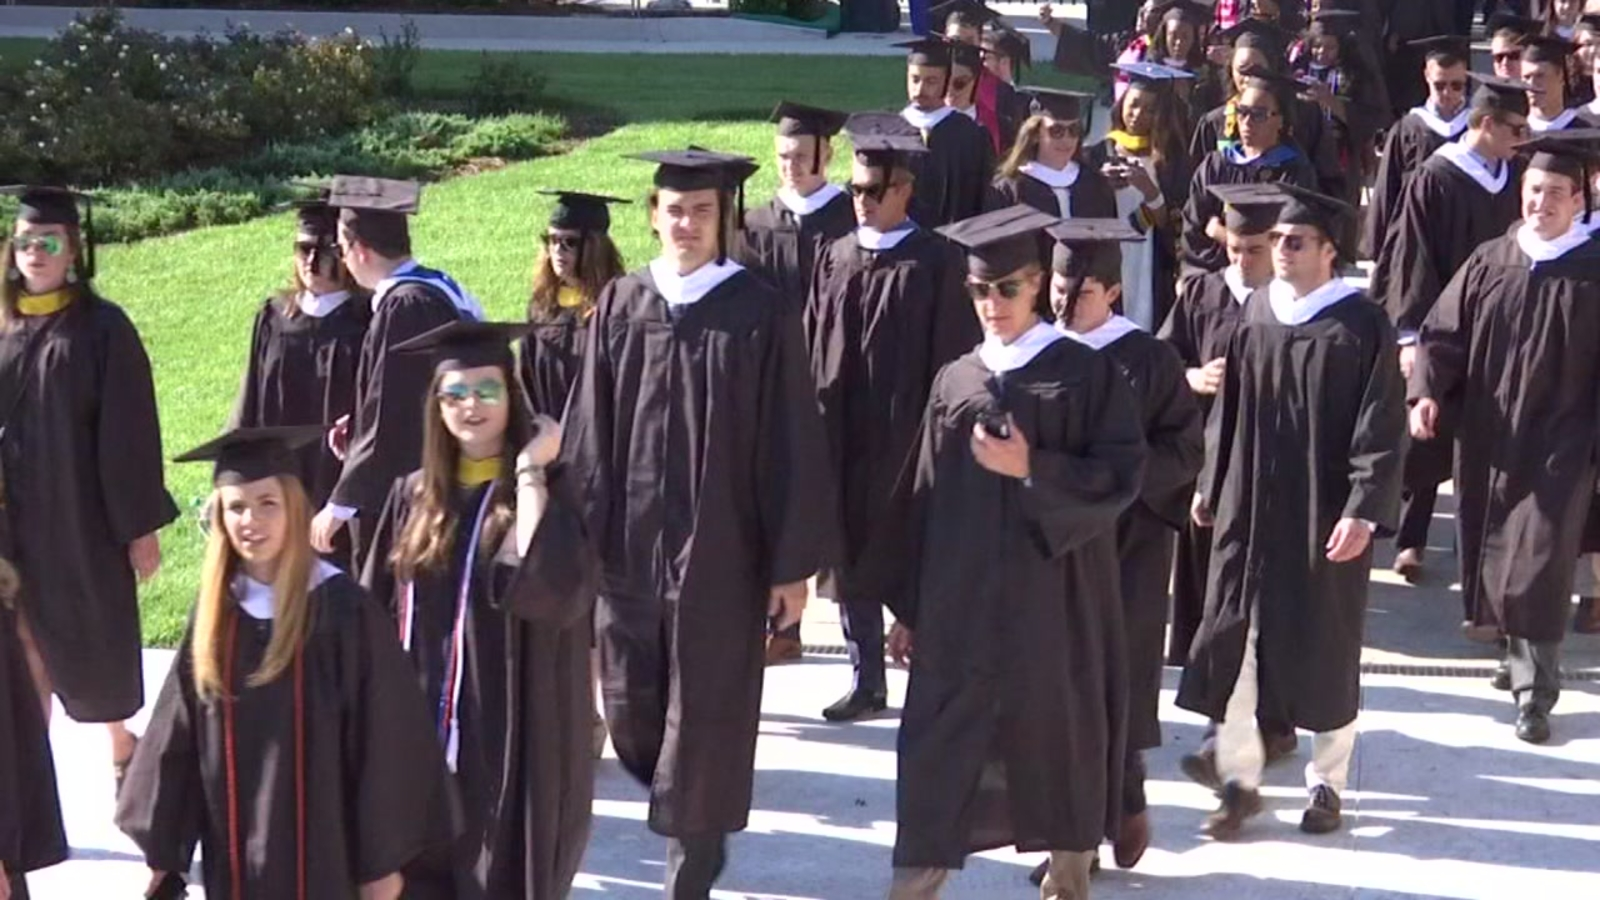 Student Finance on Flipboard | Clothing, Elizabeth Warren, College & University